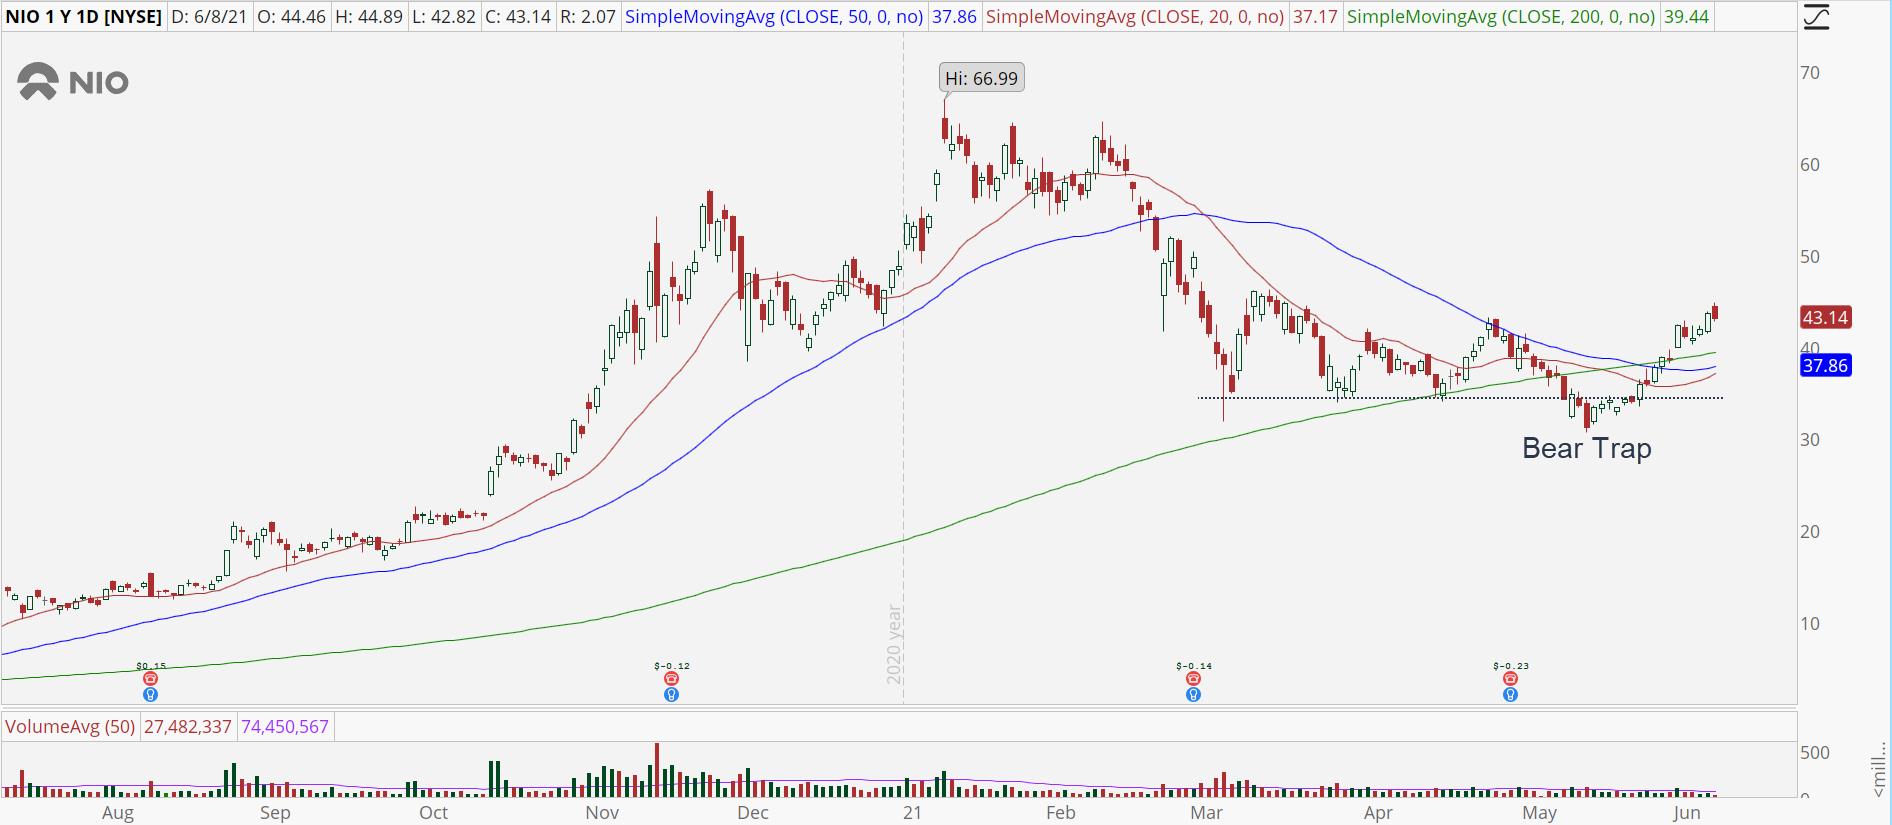 Nio (NIO) daily stock chart with bear trap pattern.